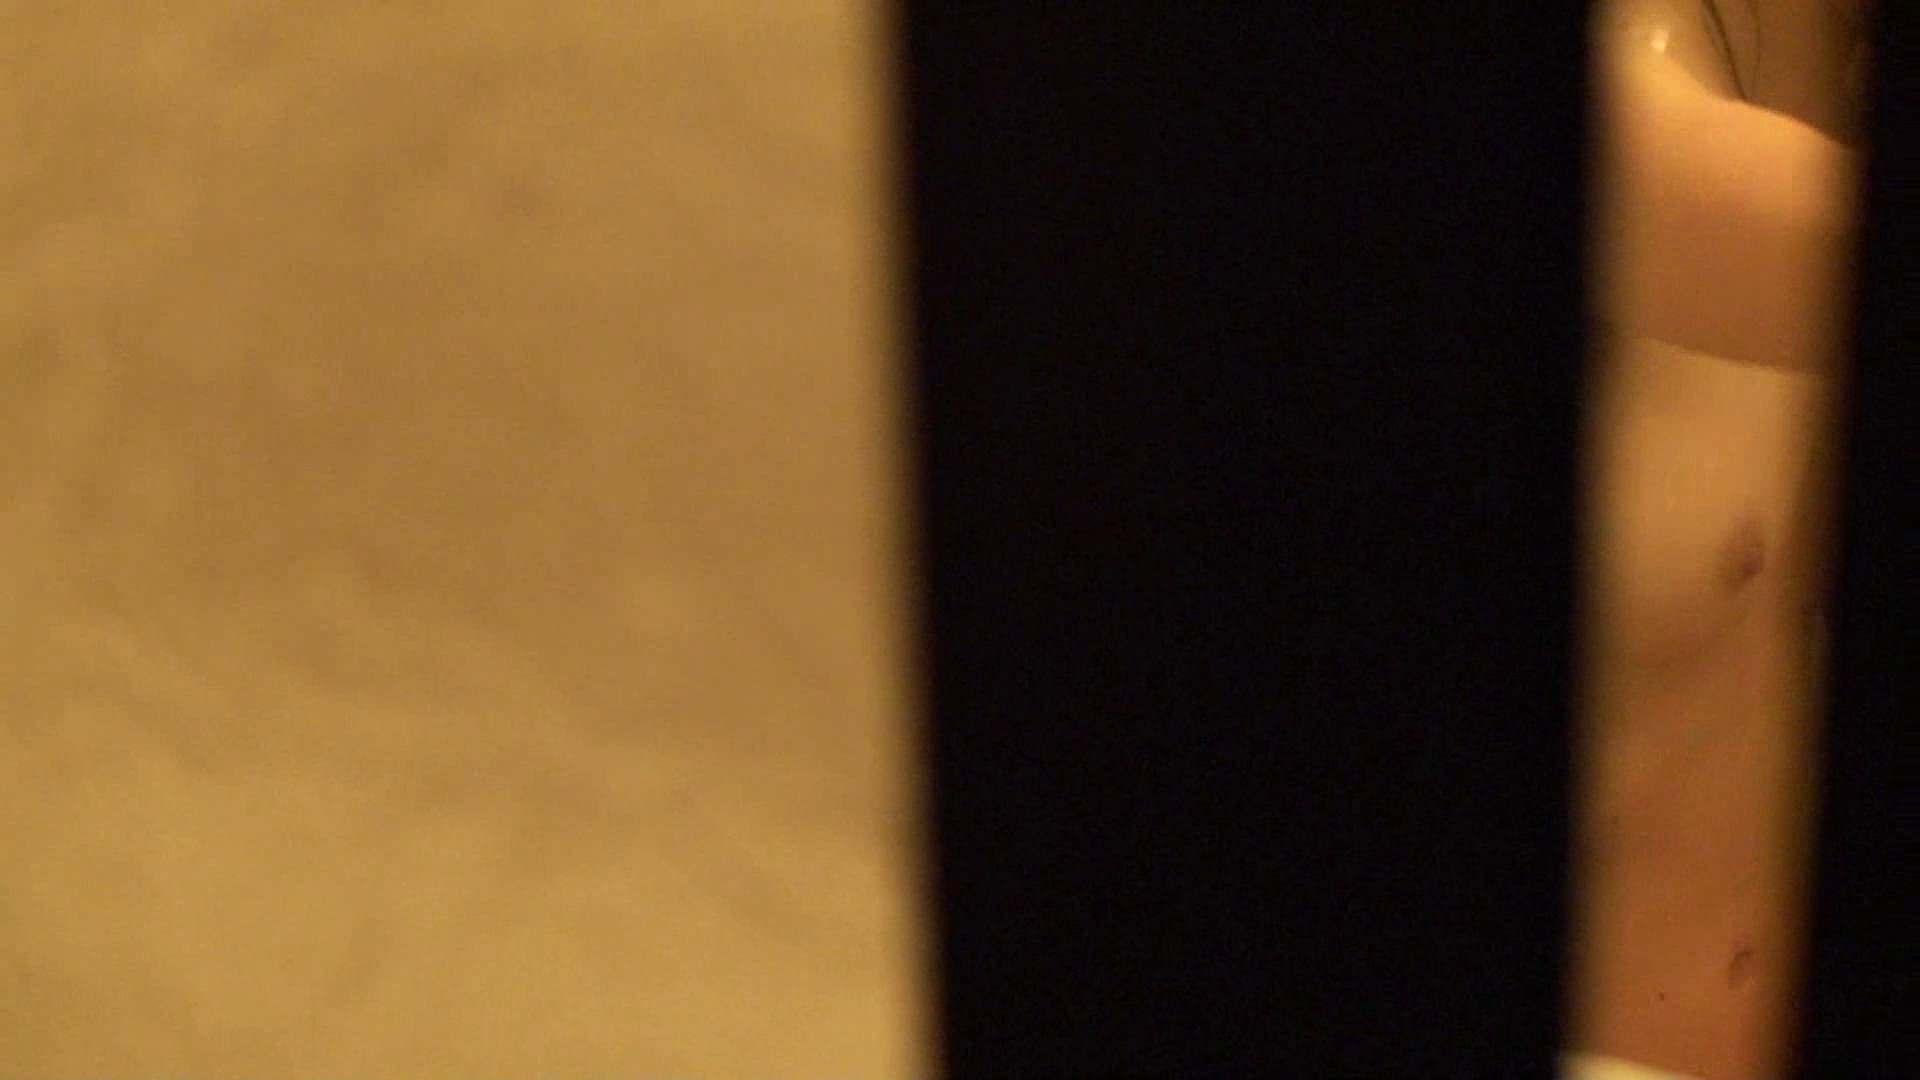 vol.02超可愛すぎる彼女の裸体をハイビジョンで!至近距離での眺め最高! 覗き ワレメ無修正動画無料 78pic 47